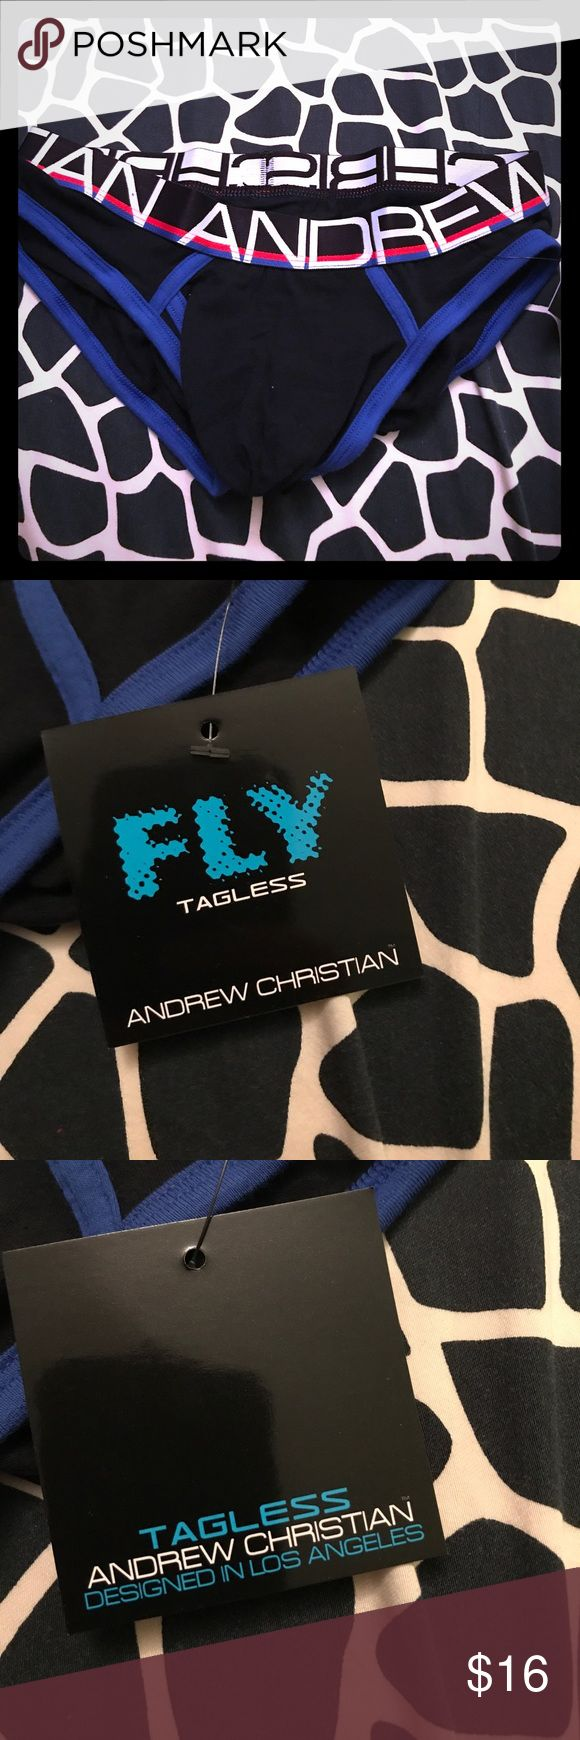 Andrew Christian sexy Fly Tagless ❤️😻❤️ Andrew Christian sexy Fly Tagless ❤️😻❤️ Brand new/Never worn!! Andrew Christian Underwear & Socks Briefs